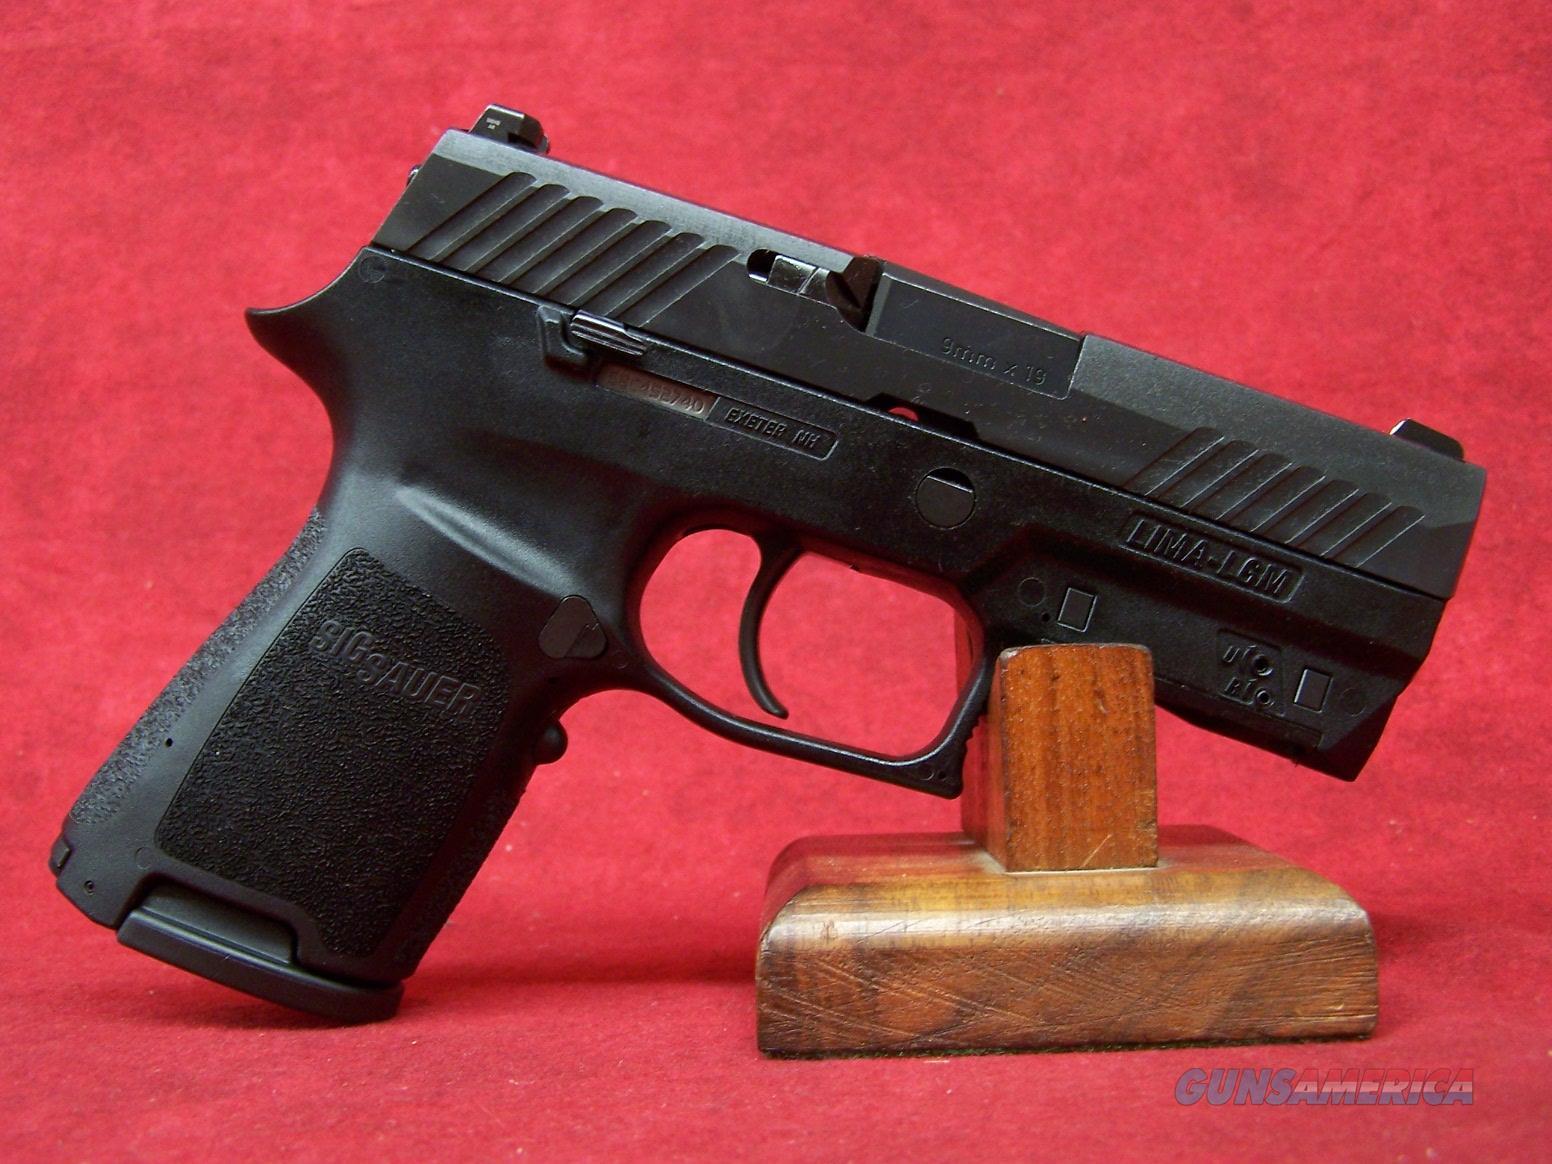 "Sig Sauer P320 LIMA 9mm w/Built in Green Laser & Night Sights 3.9"" Barrel (320C-9-BSS-LIMA-G)  Guns > Pistols > Sig - Sauer/Sigarms Pistols > P320"